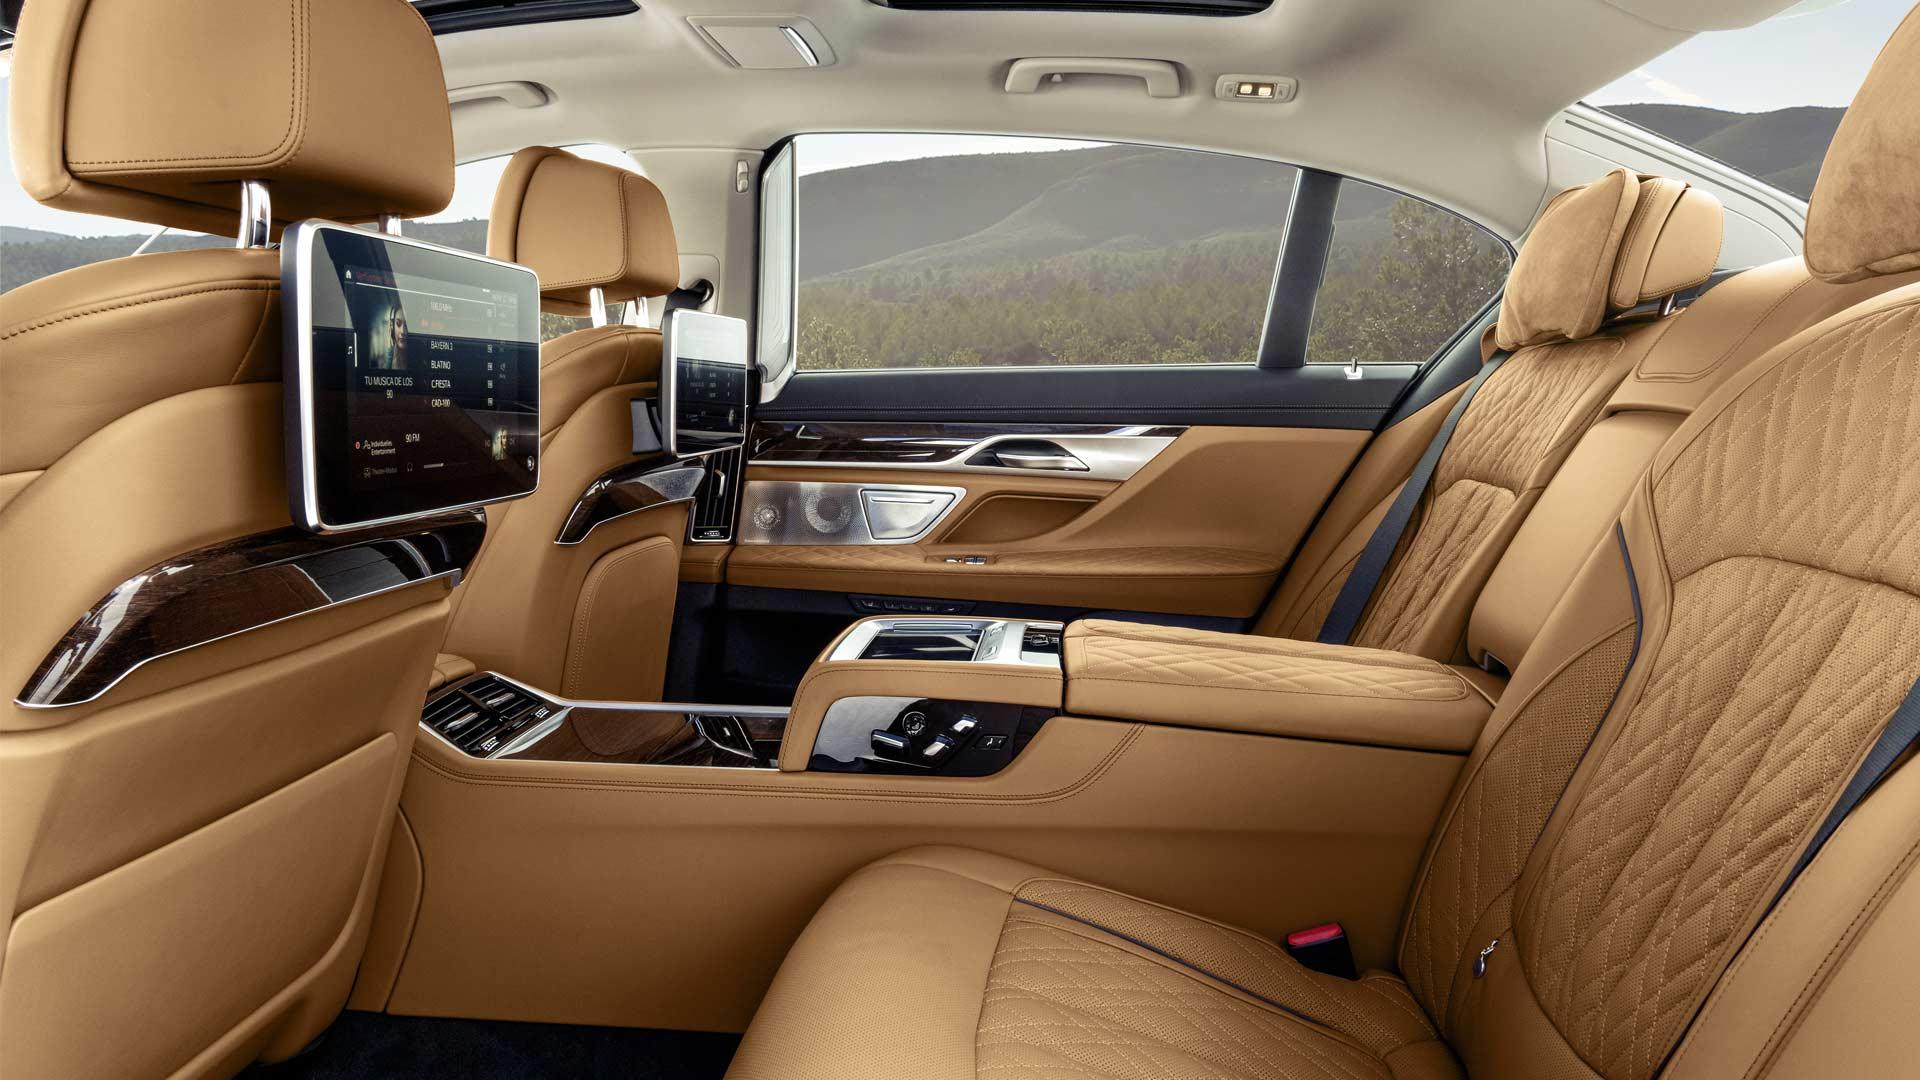 2020-BMW-7-Series-Interior_5